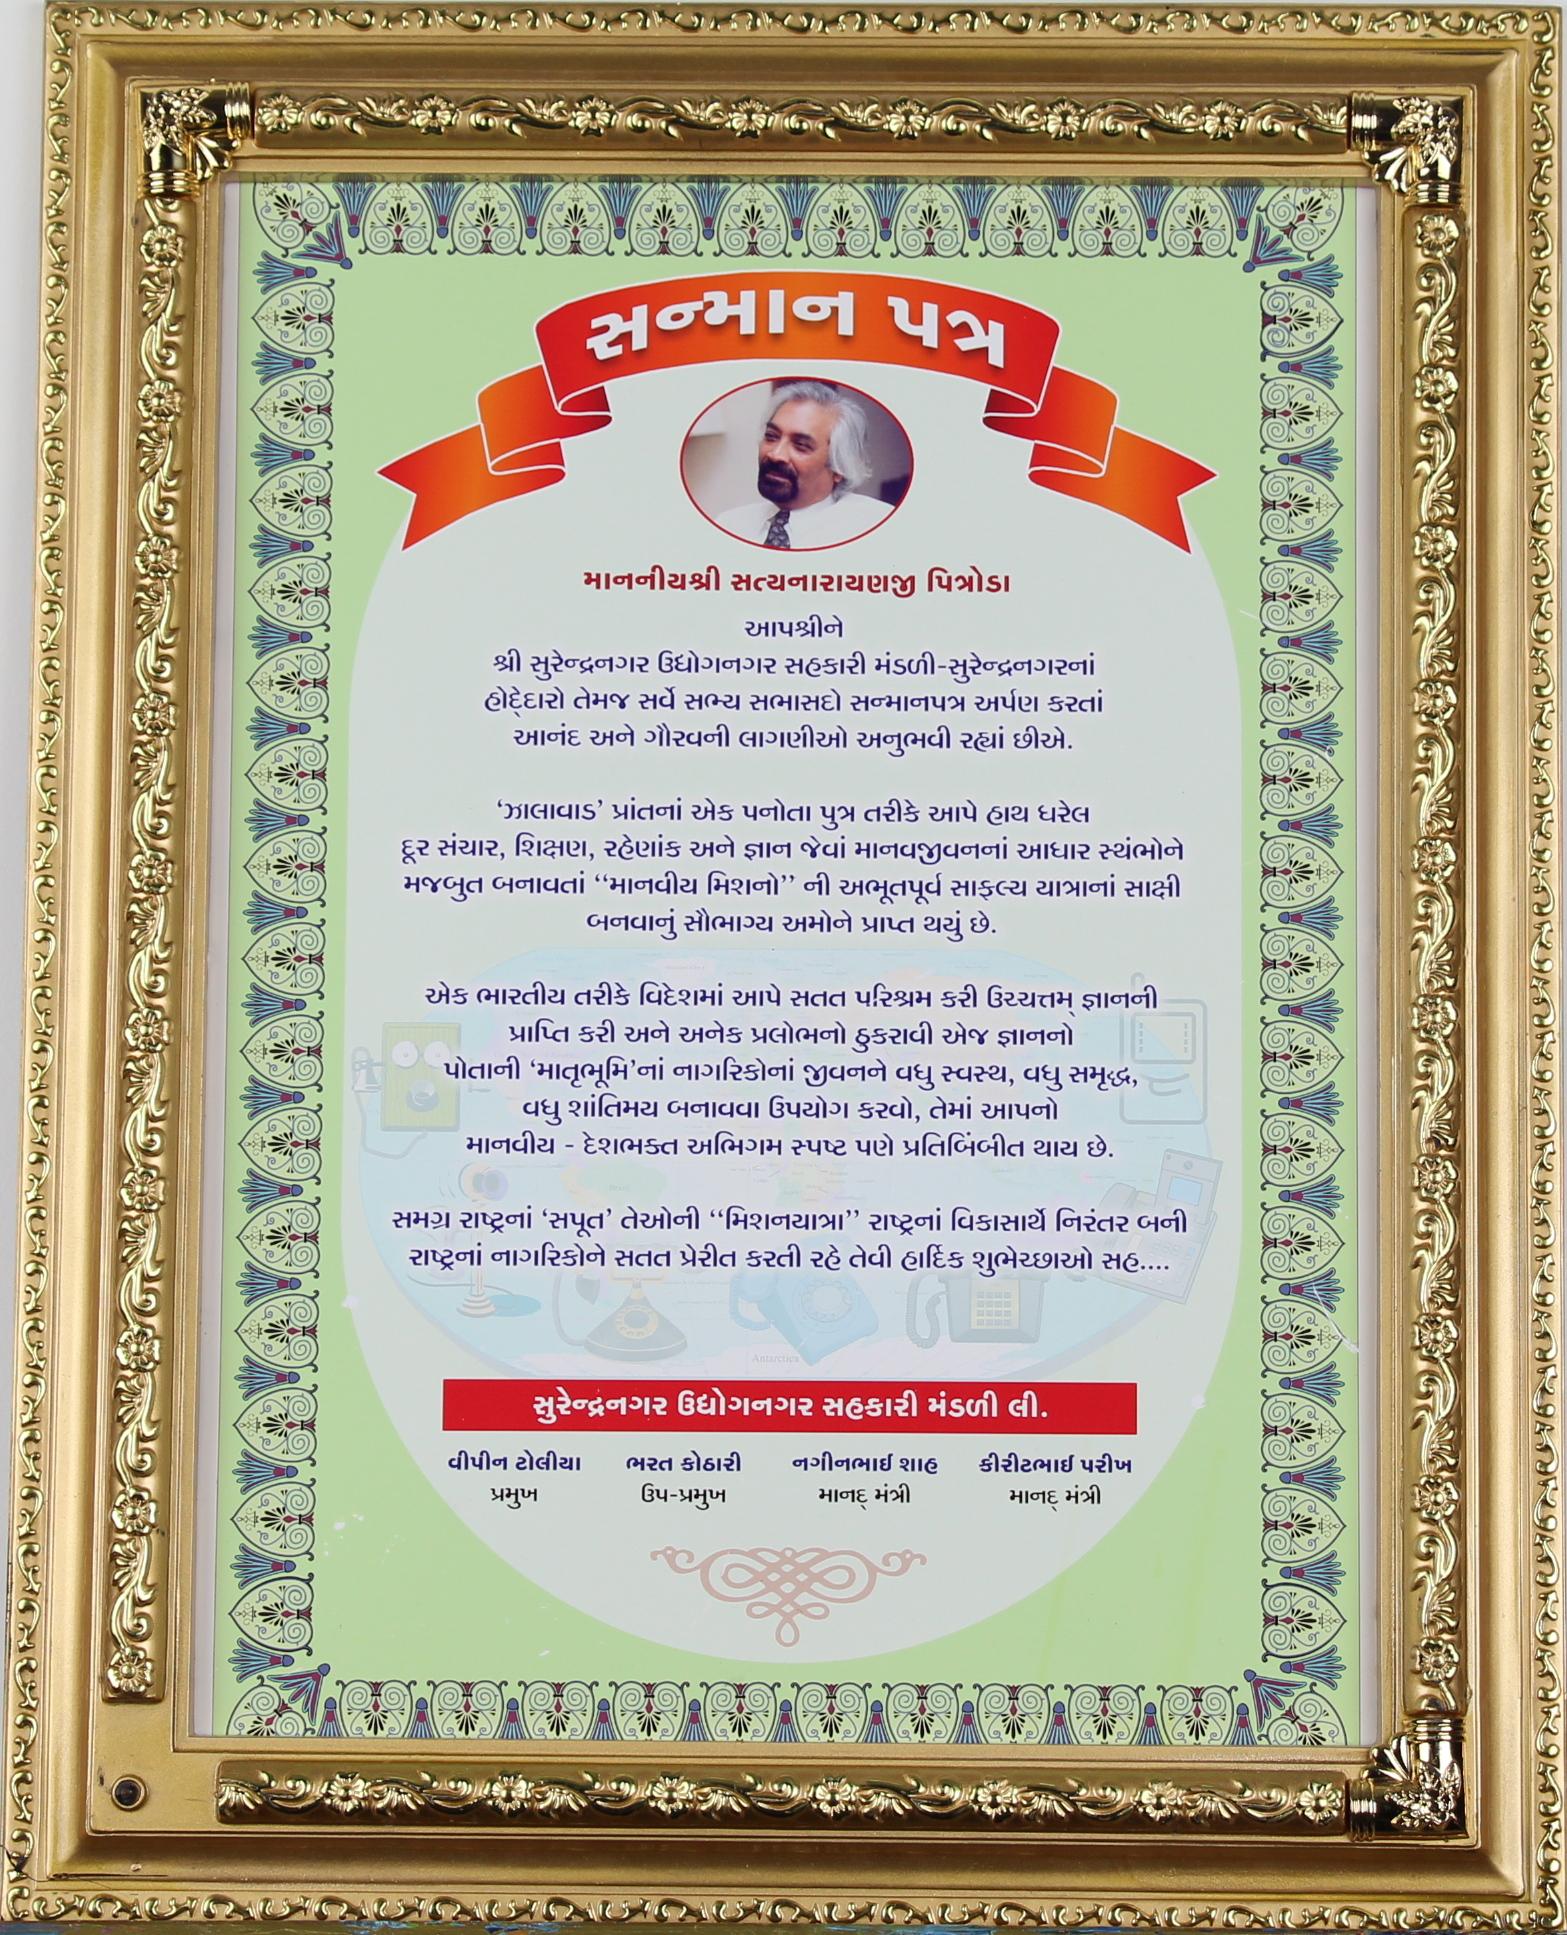 Award of Appreciation, Surendra Nagar Udyog Nagar Sahakari Mandli Limited